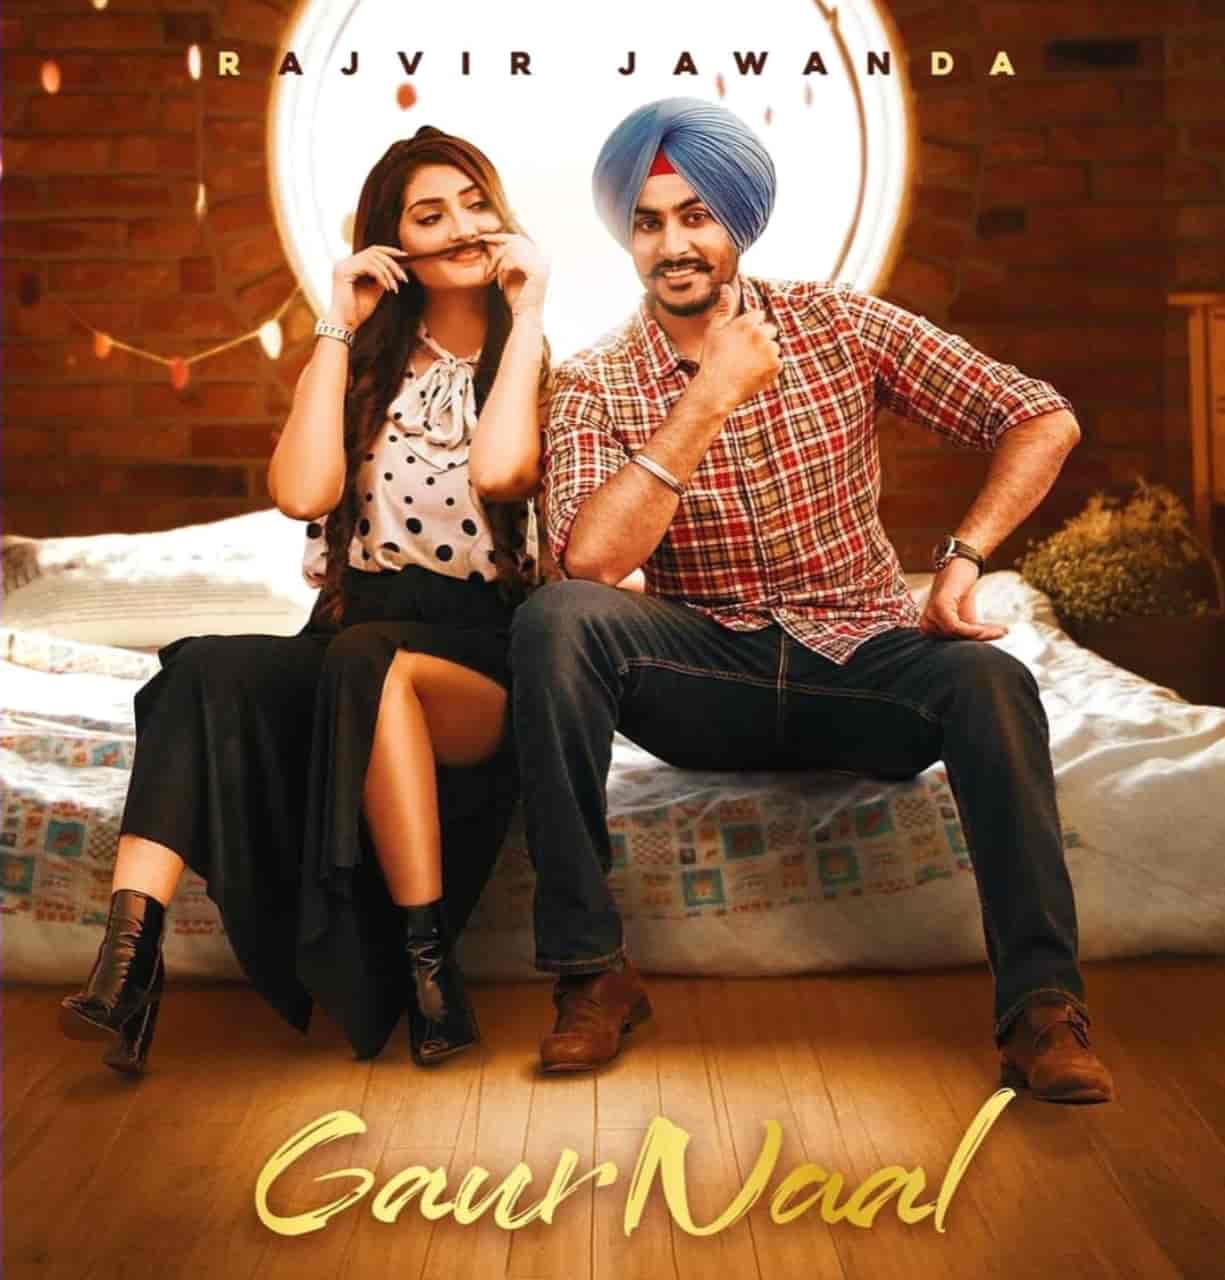 Gaur Naal Punjabi Song Image Features Rajvir Jawanda